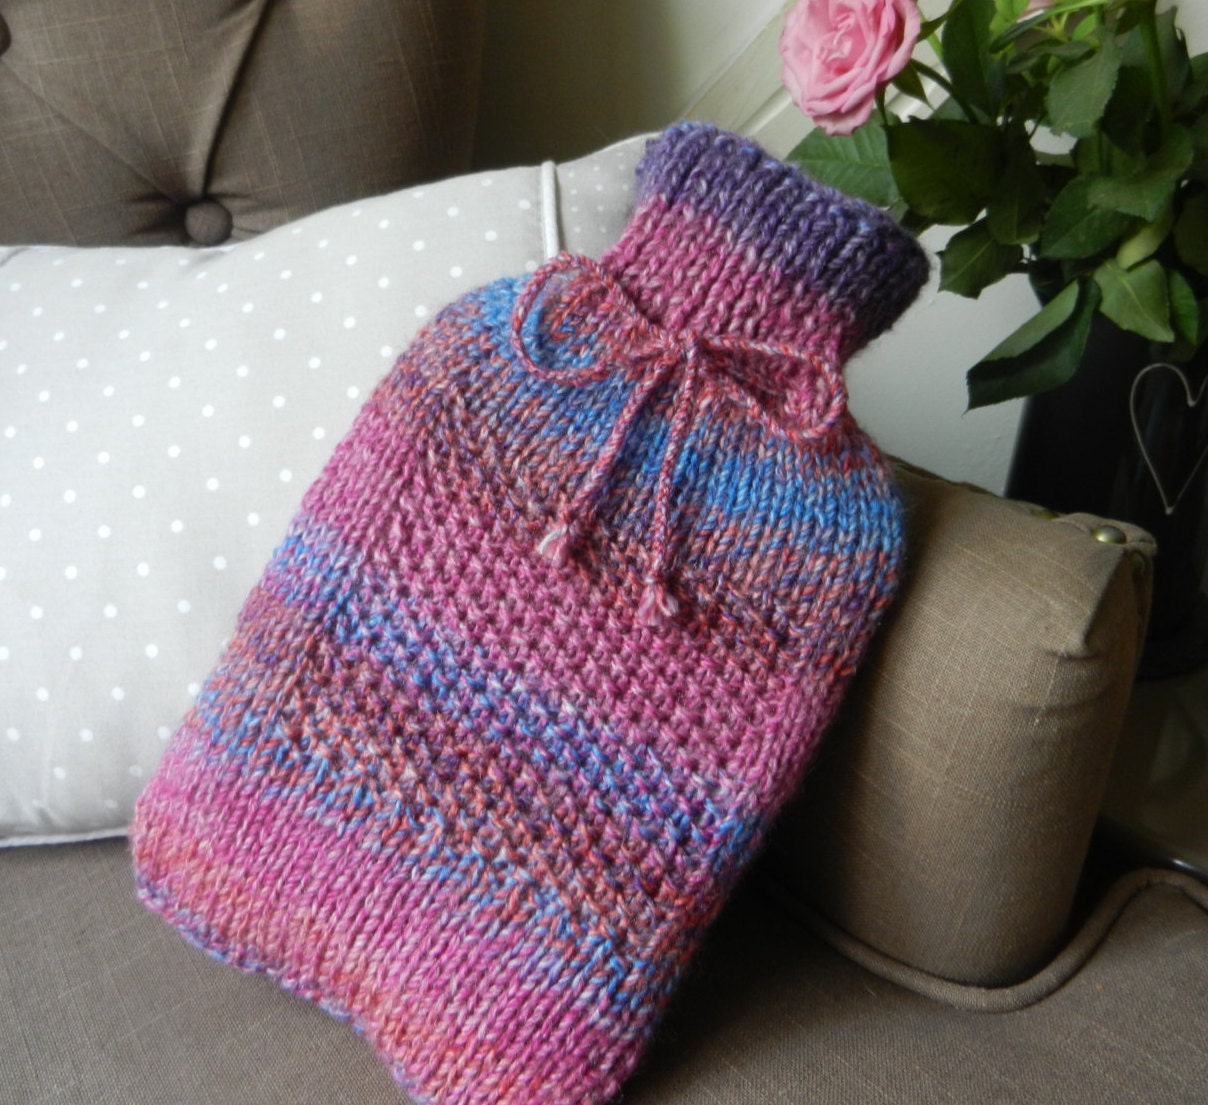 knitted hot water bottle cover cozy purple by LafantUK on Etsy